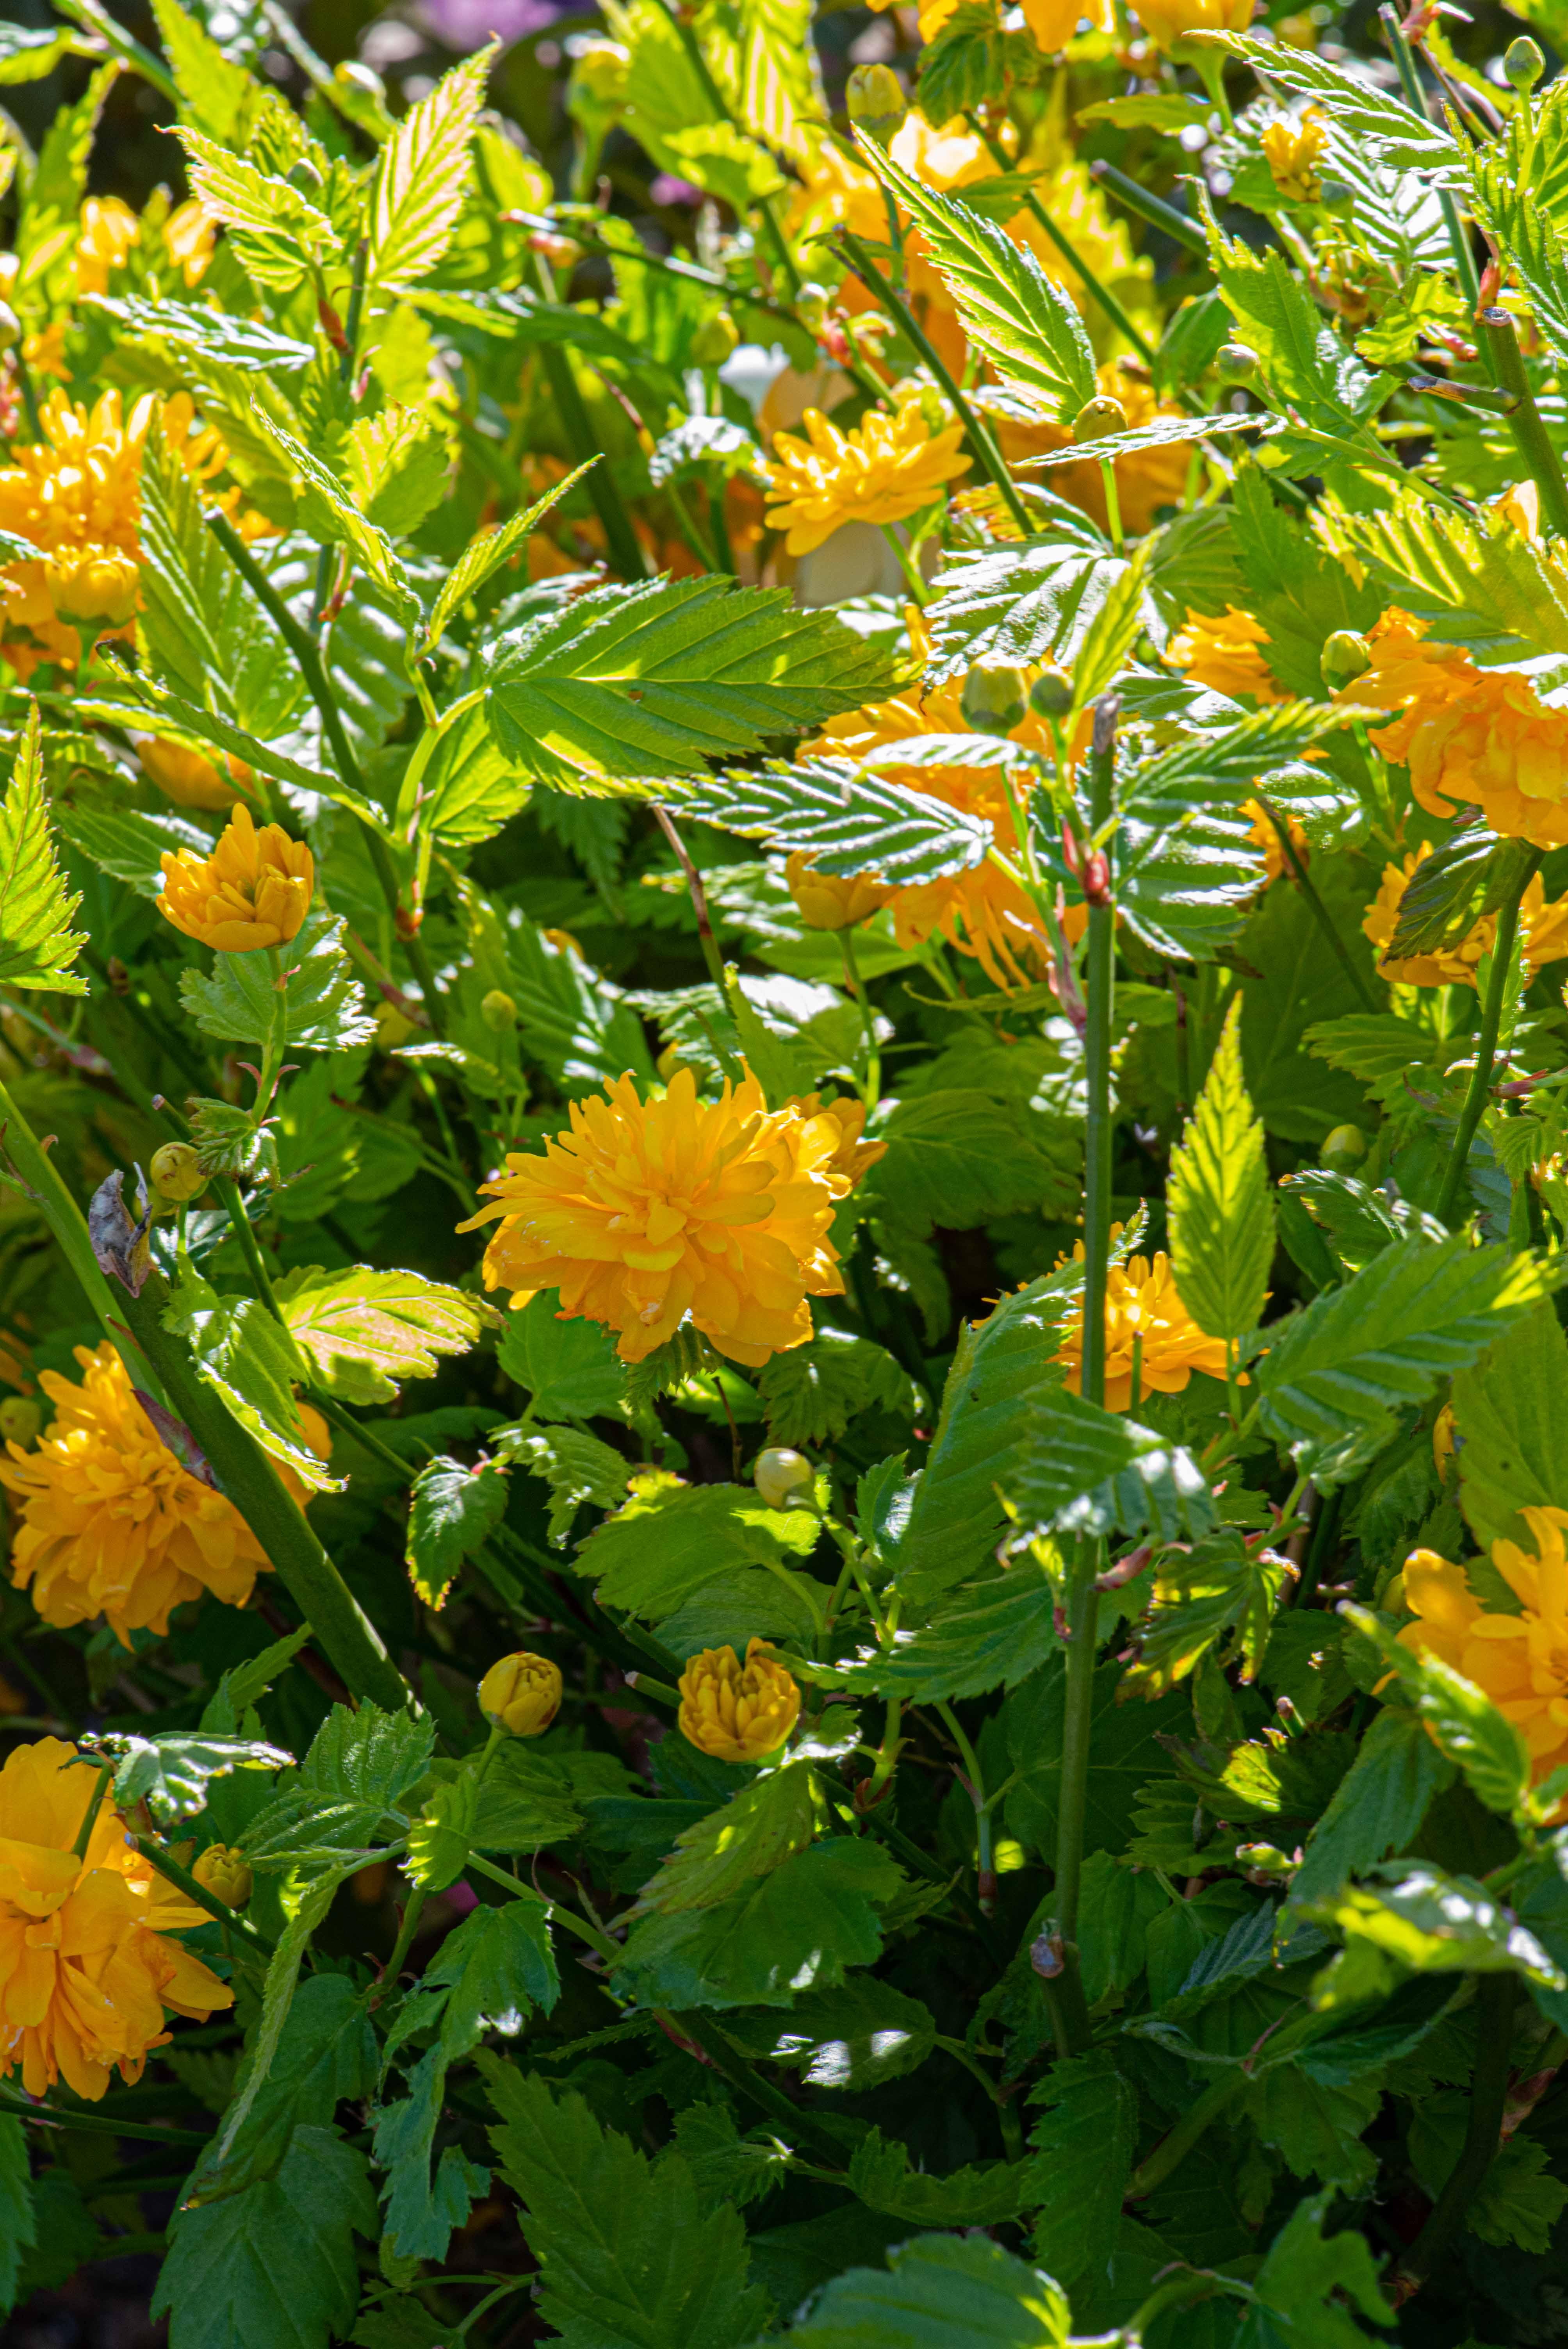 Kerria japonica 'Pleniflora', Shrub, Japanese Marigold Bush, Part Shade